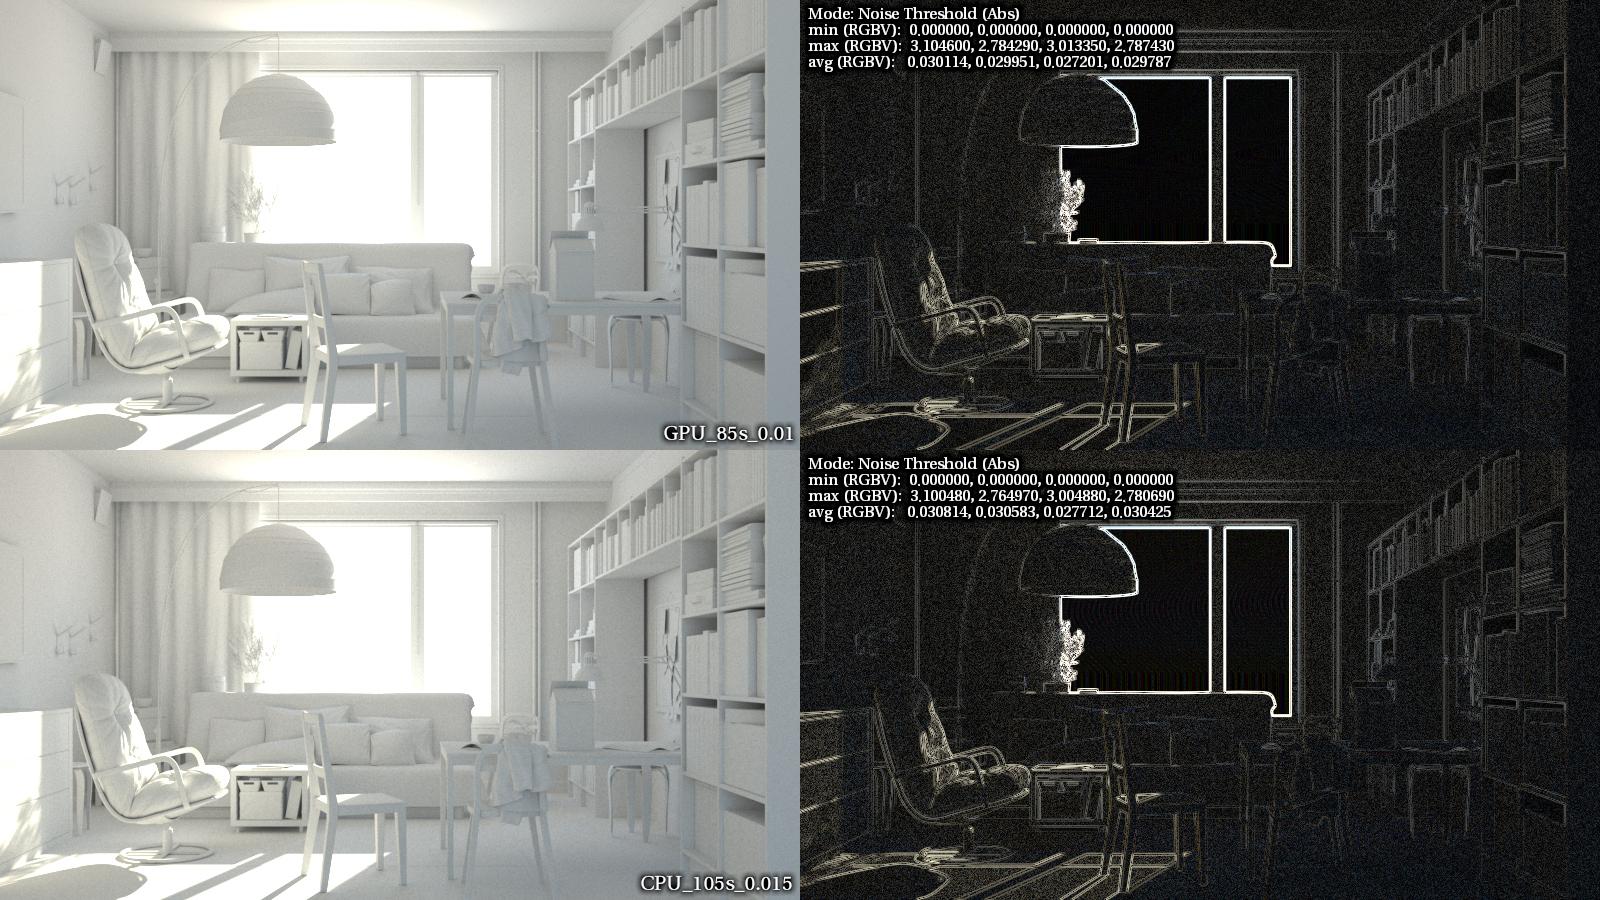 GPU_85s_0_HR_01.exr_CS.jpg.9ffcd6aa57a6245885517c2743a9ba2b.jpg